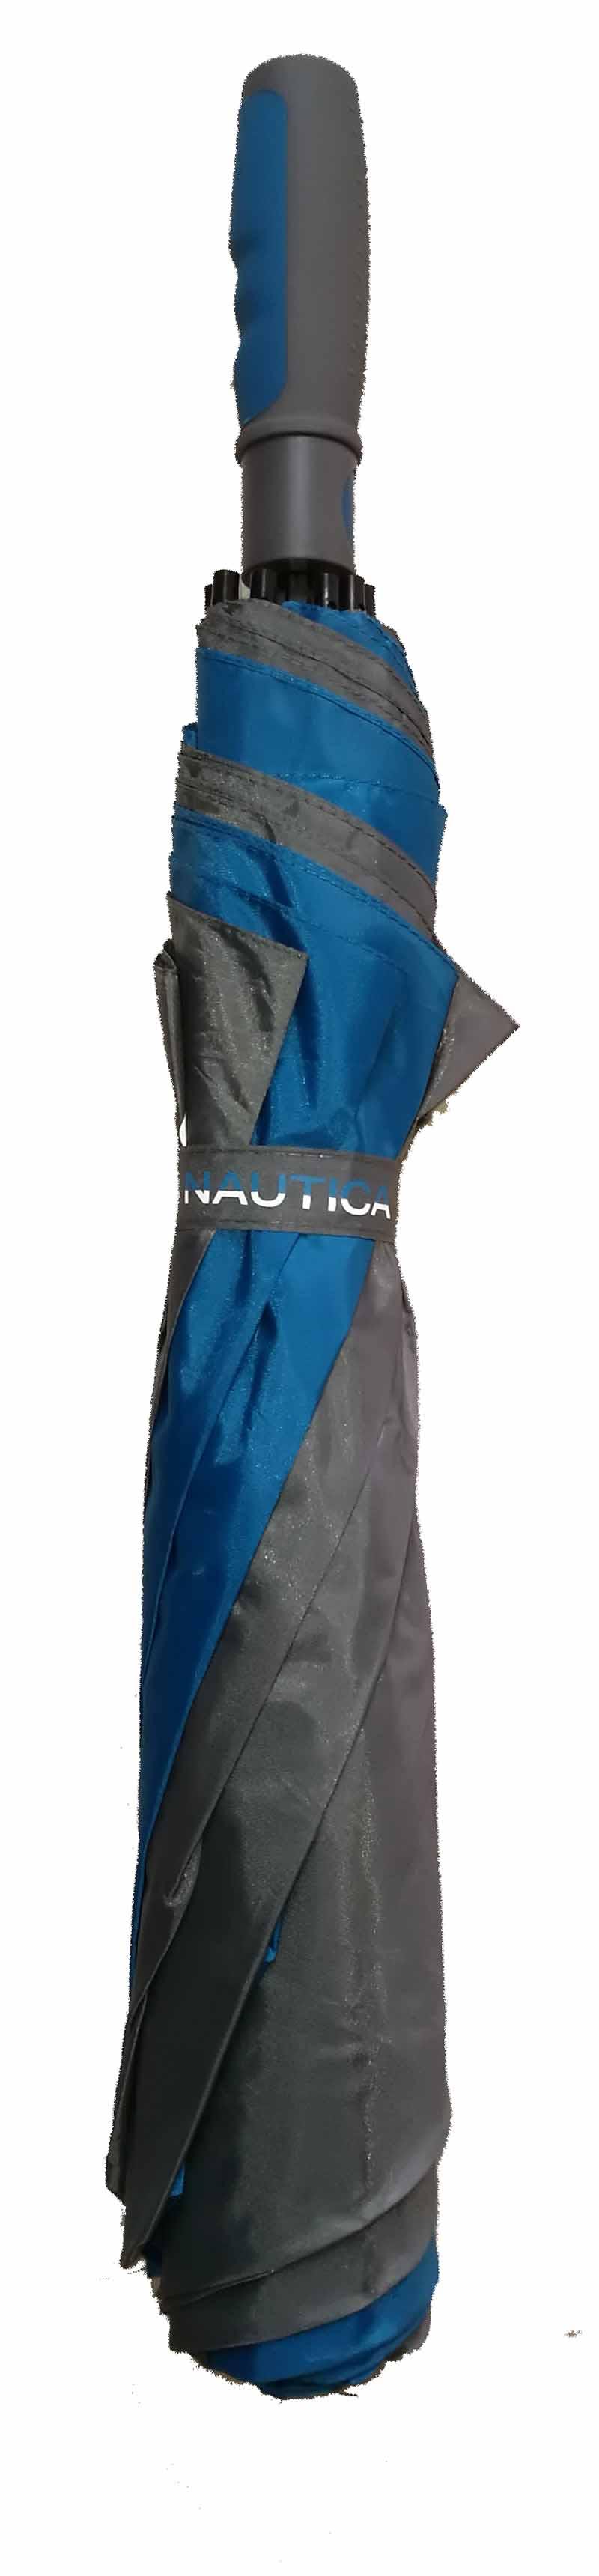 Sombrilla de golf Nautica gris 60 01